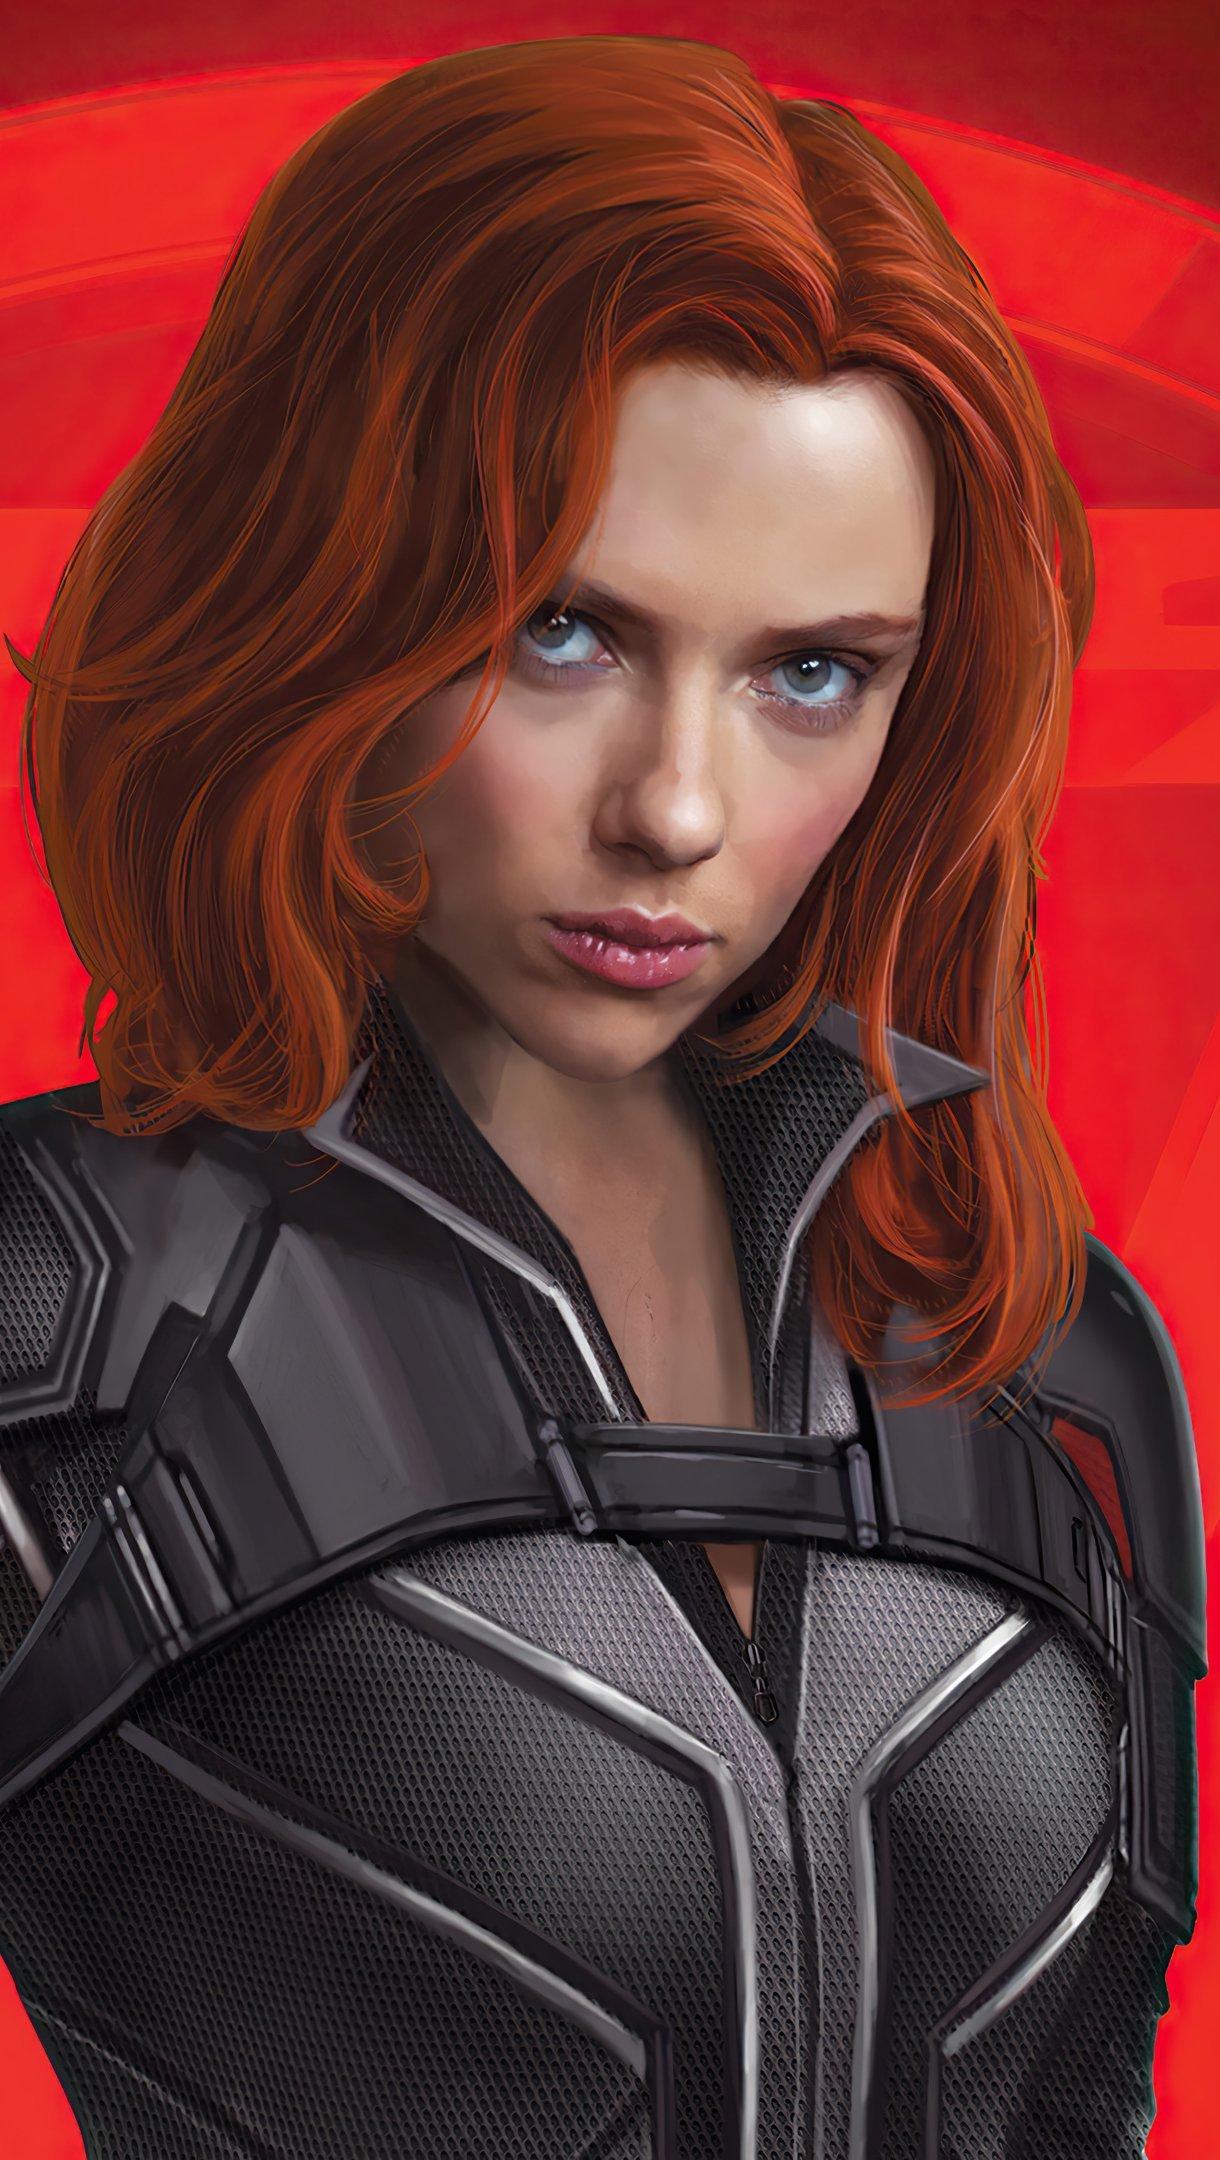 Wallpaper Black Widow Movie Art Vertical